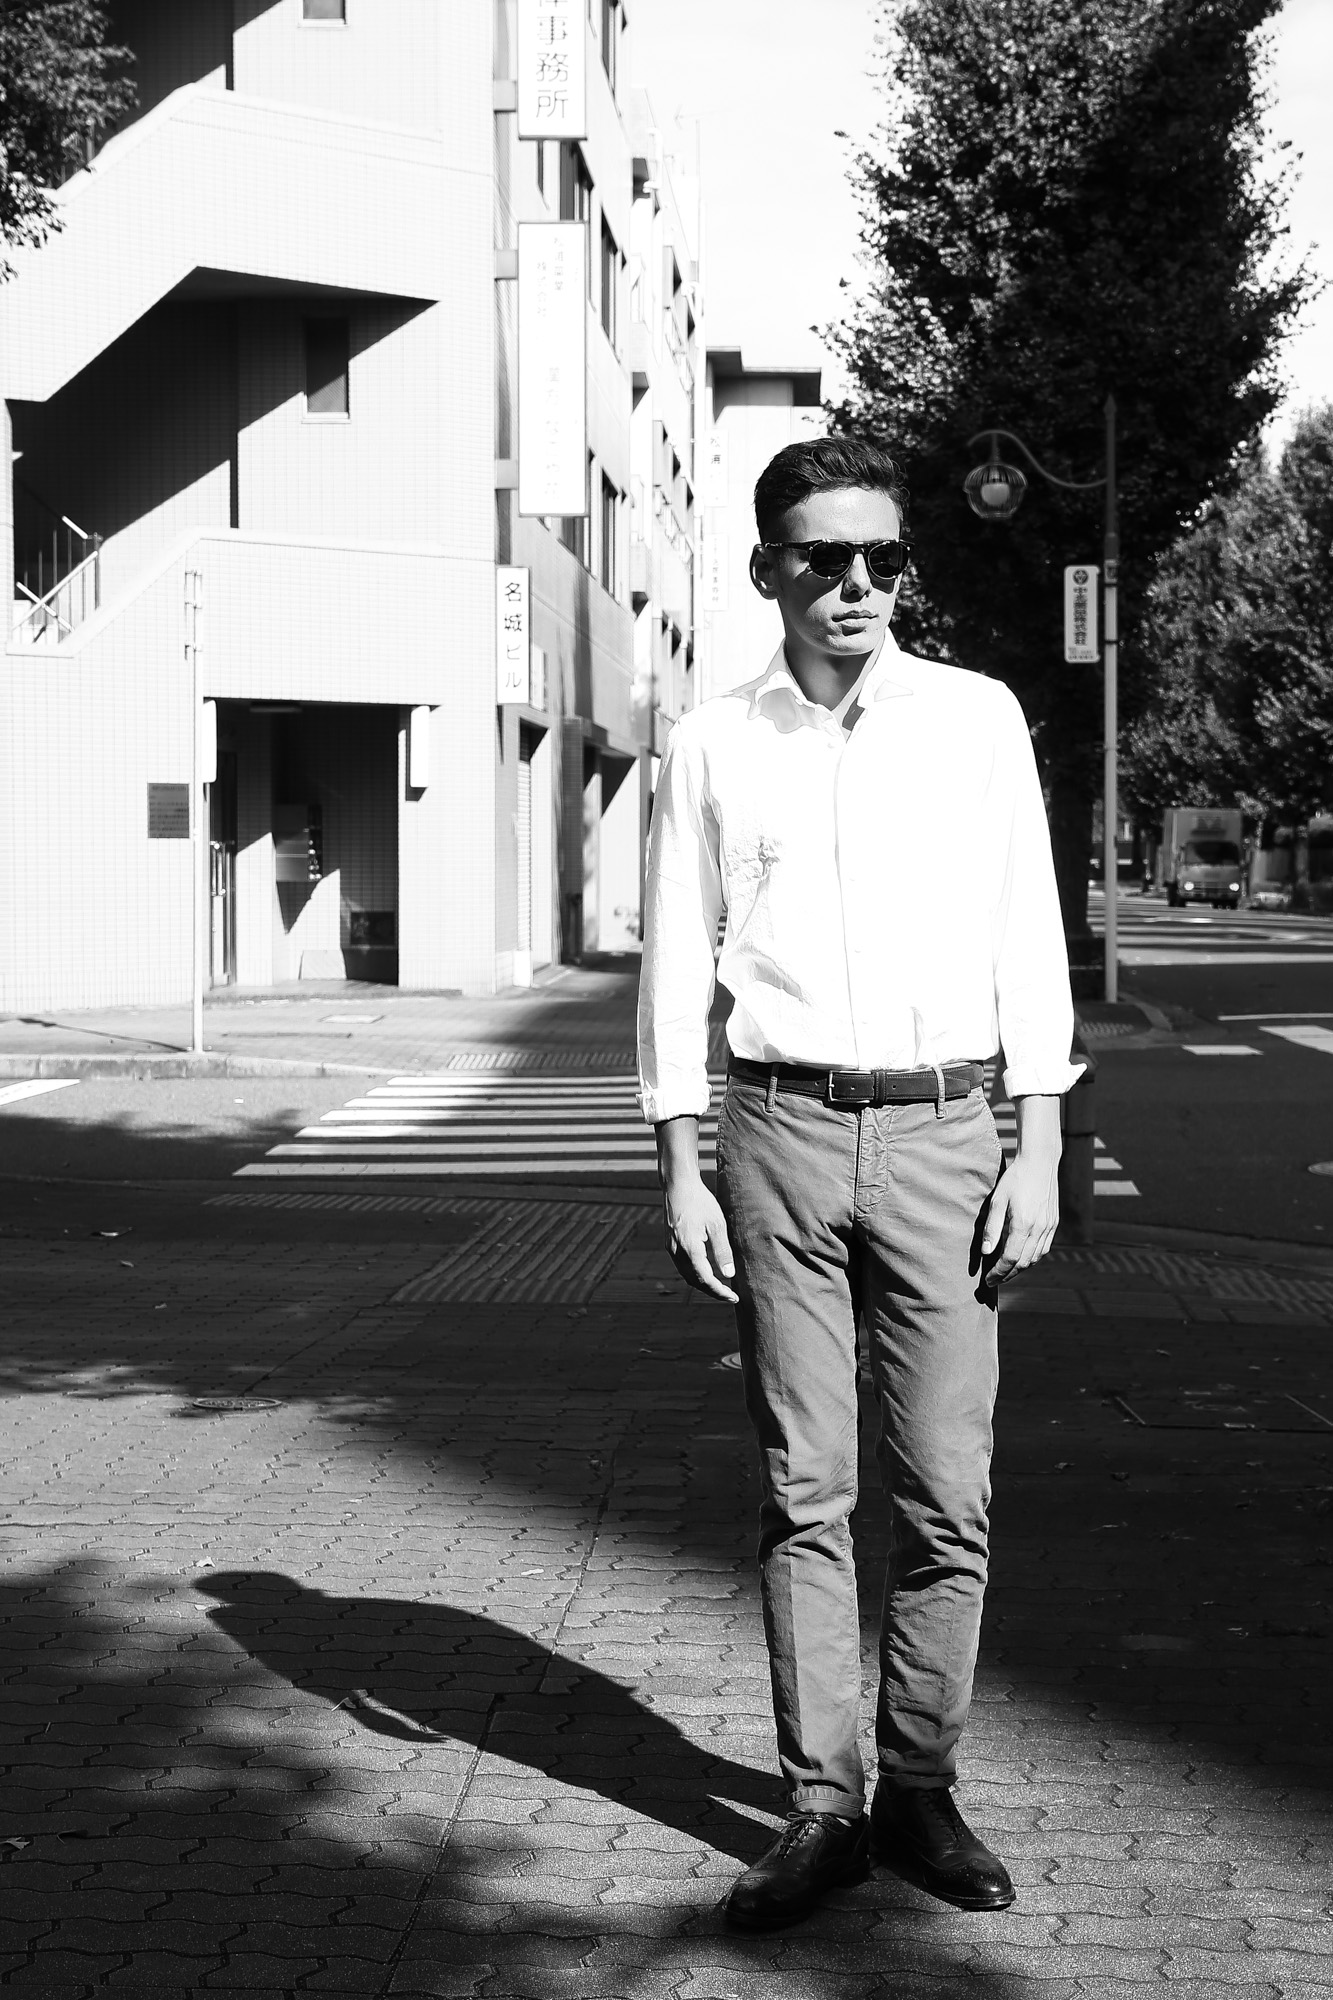 Han Kjobenhavn(ハンコペンハーゲン) TIMELESS CLIP ON タイムレス クリップオン ボストンタイプ 丸形レトロデザイン サングラス AMBER/SUN(GREEN)(アンバー/サン・グリーン) MADE IN ITALY(イタリア製) のコーディネート画像。愛知 名古屋 ZODAC ゾディアック デンマーク コペンハーゲン眼鏡 アイウェア サングラス